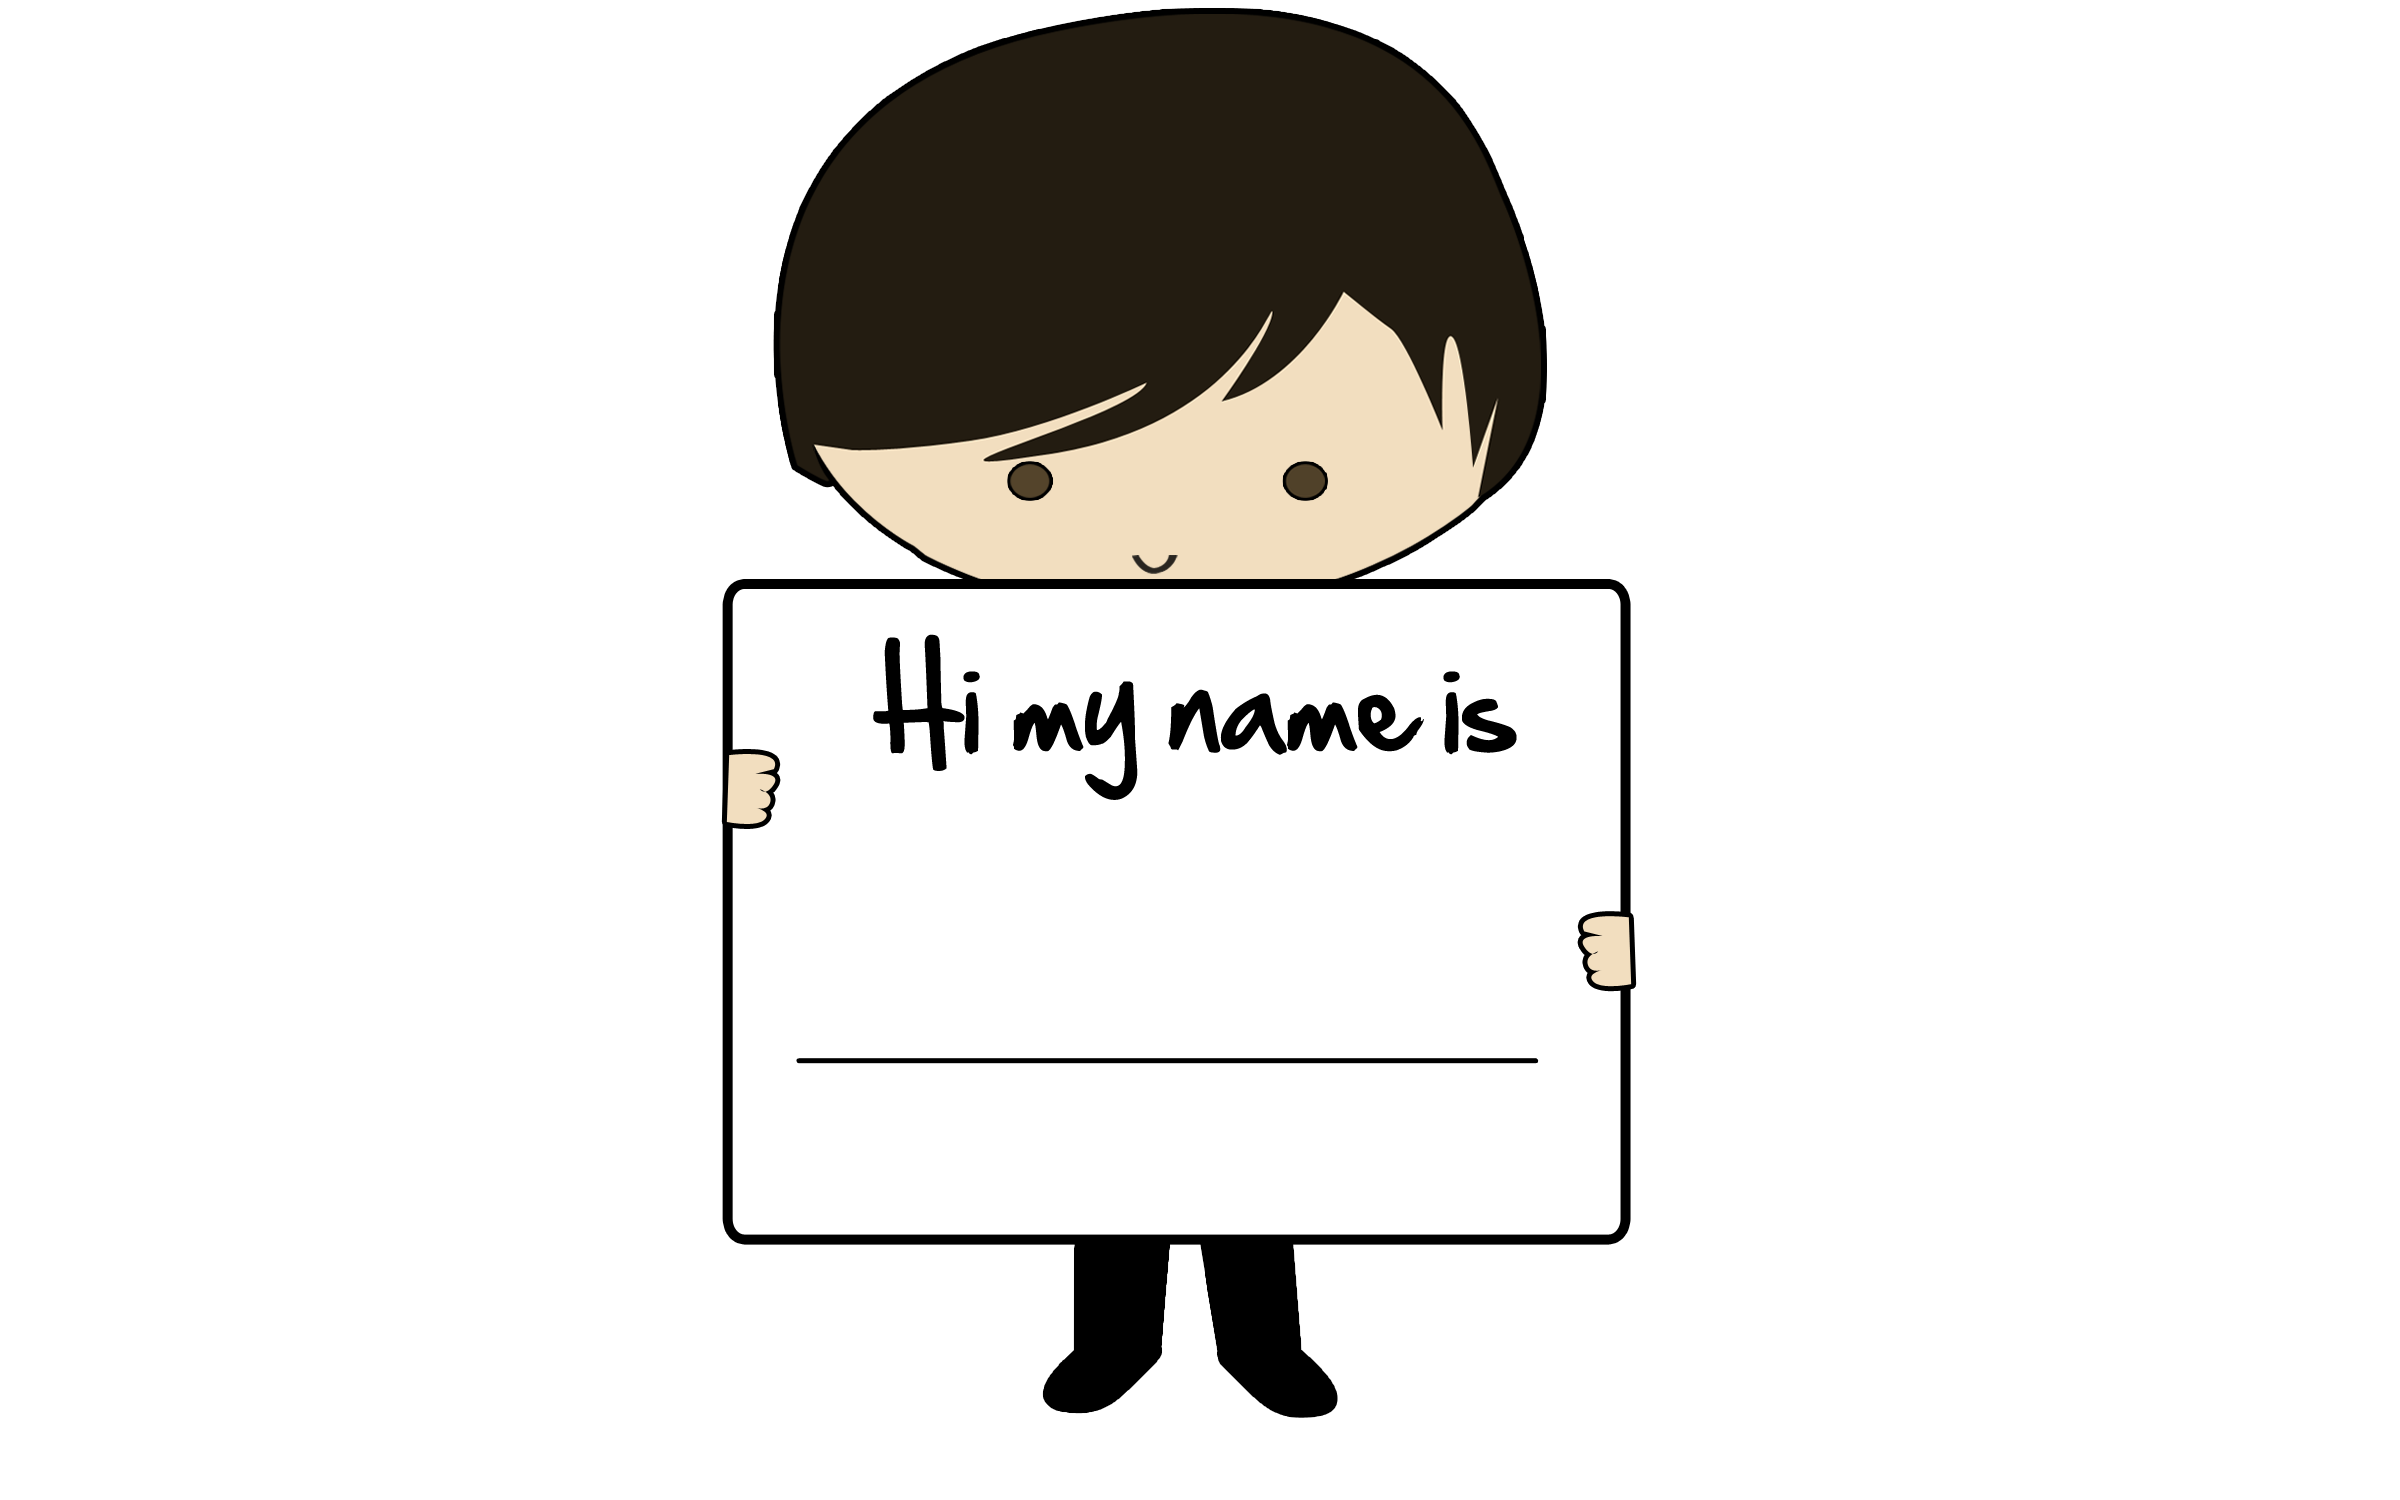 Name clipart name card, Name name card Transparent FREE for.